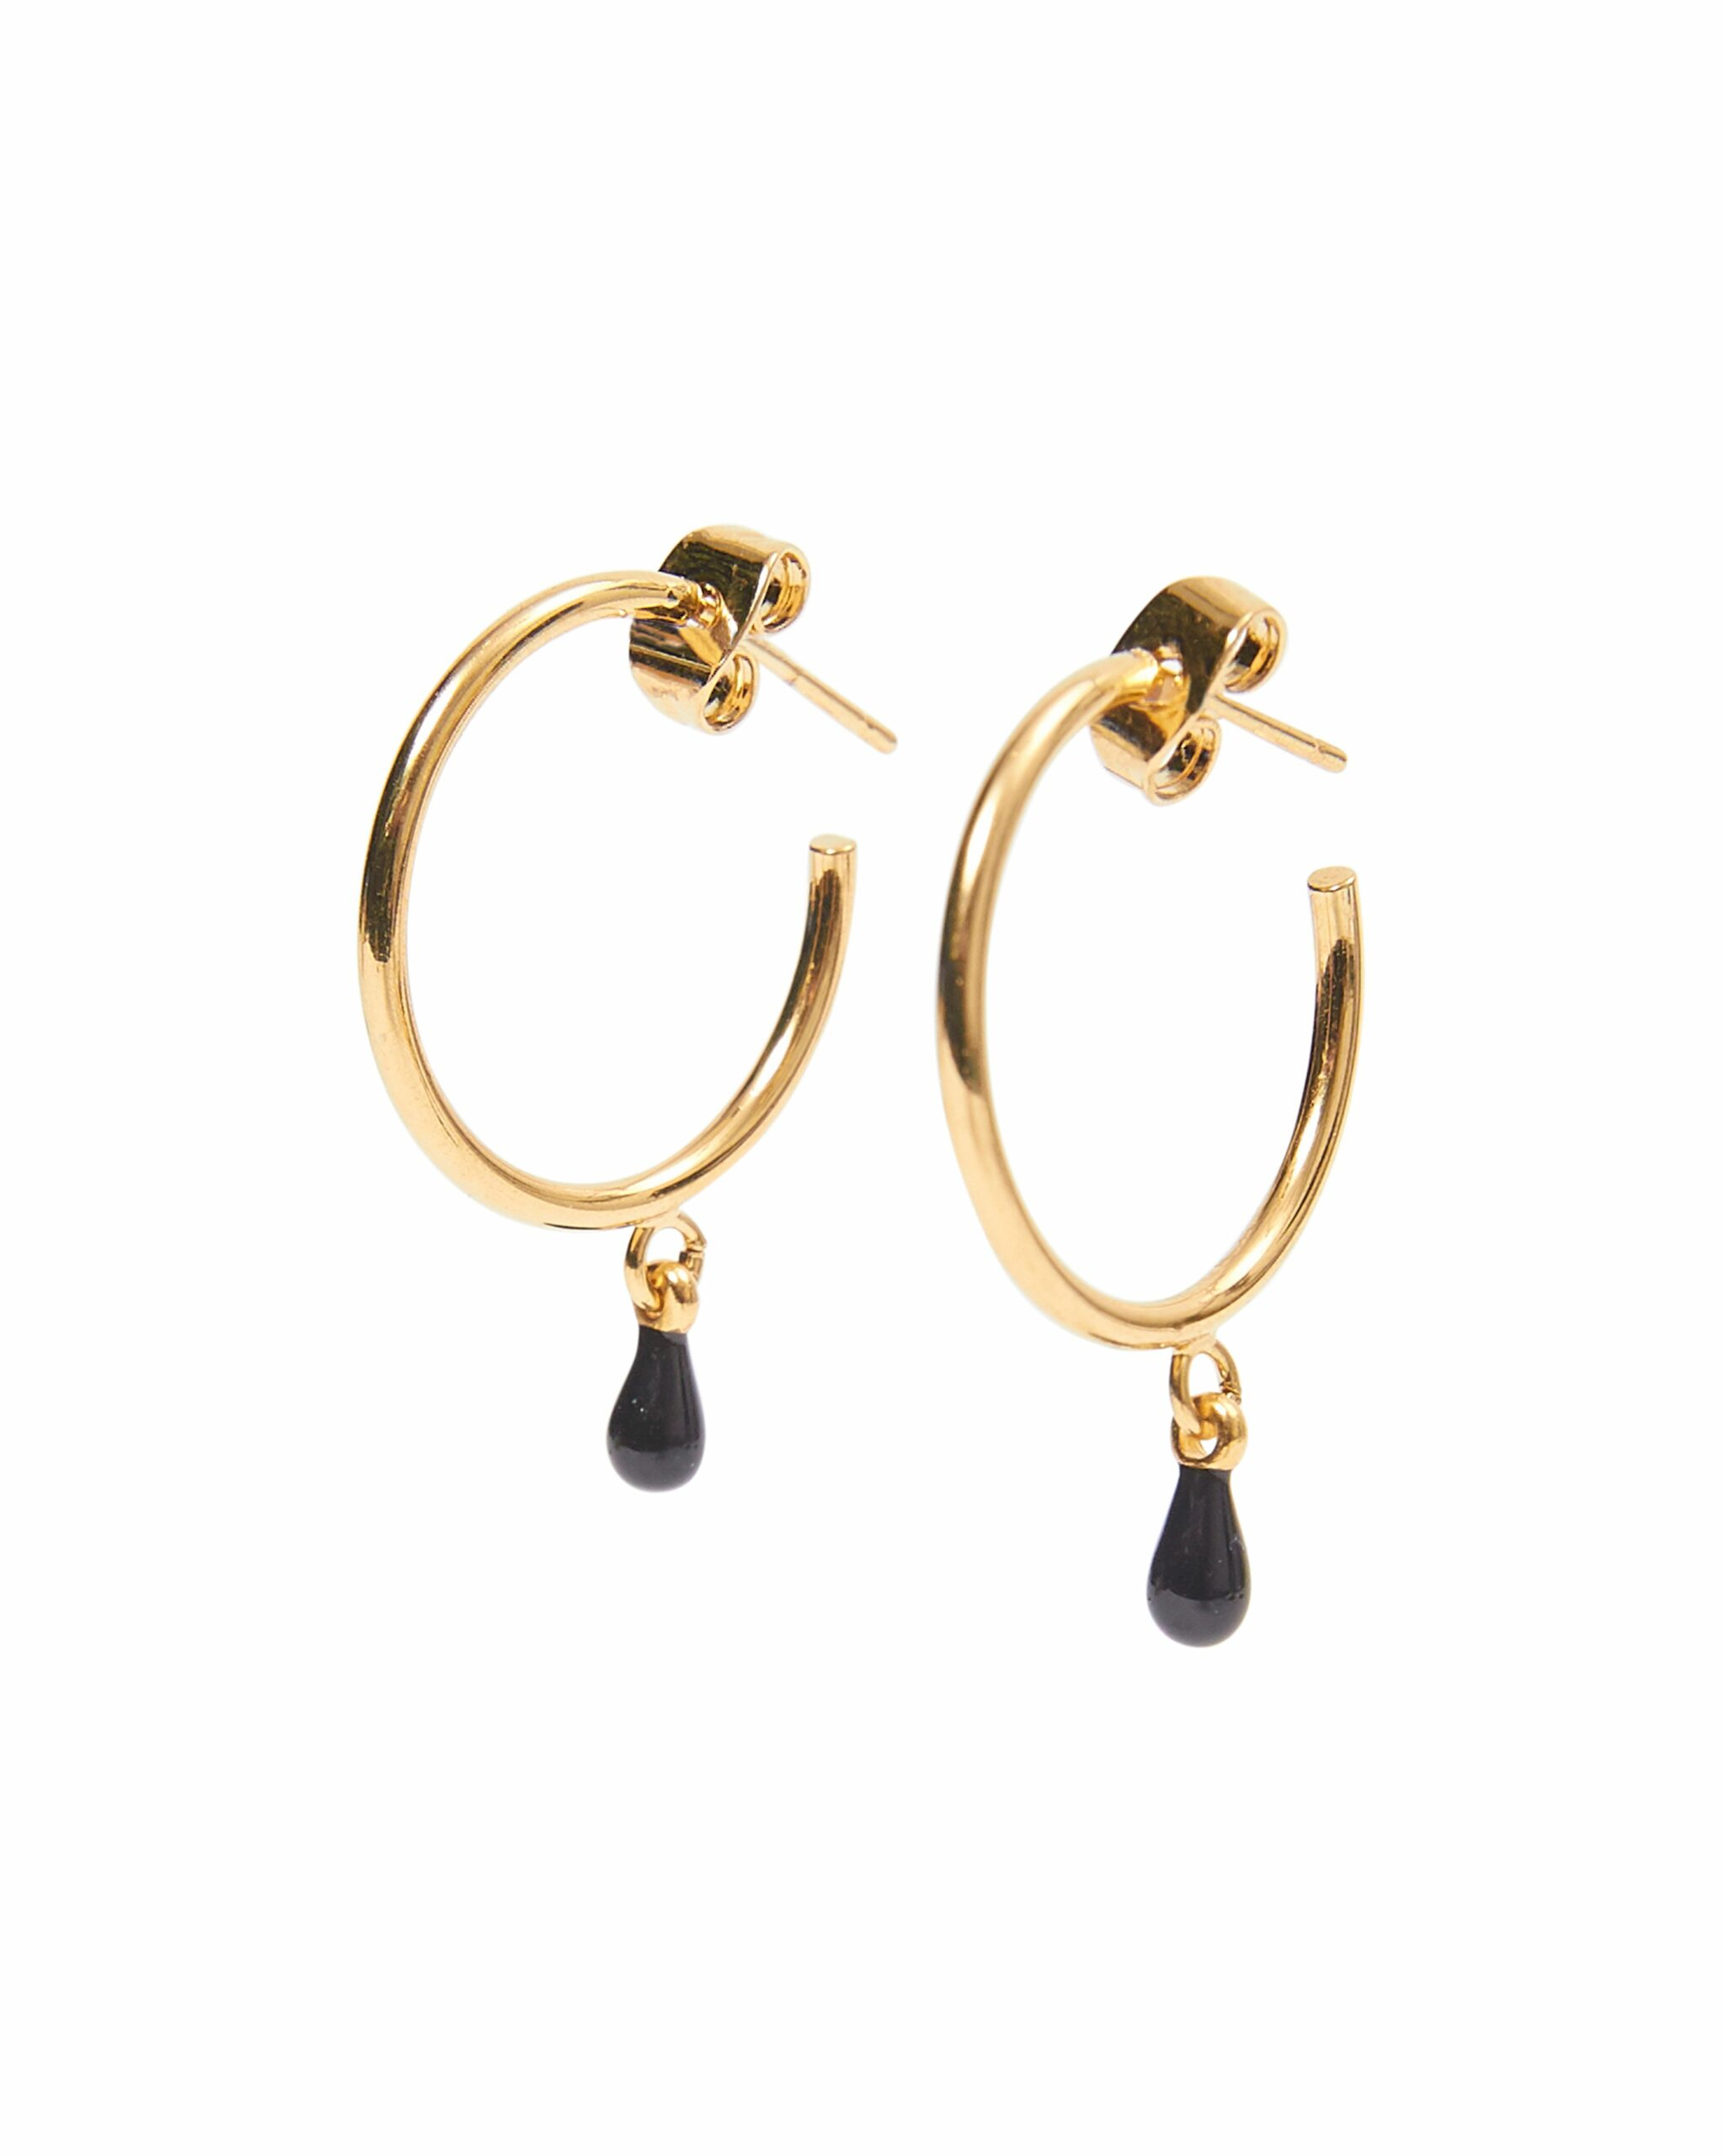 Fine Jewelry, Isabel Marant, Casablanca, Ohrringe